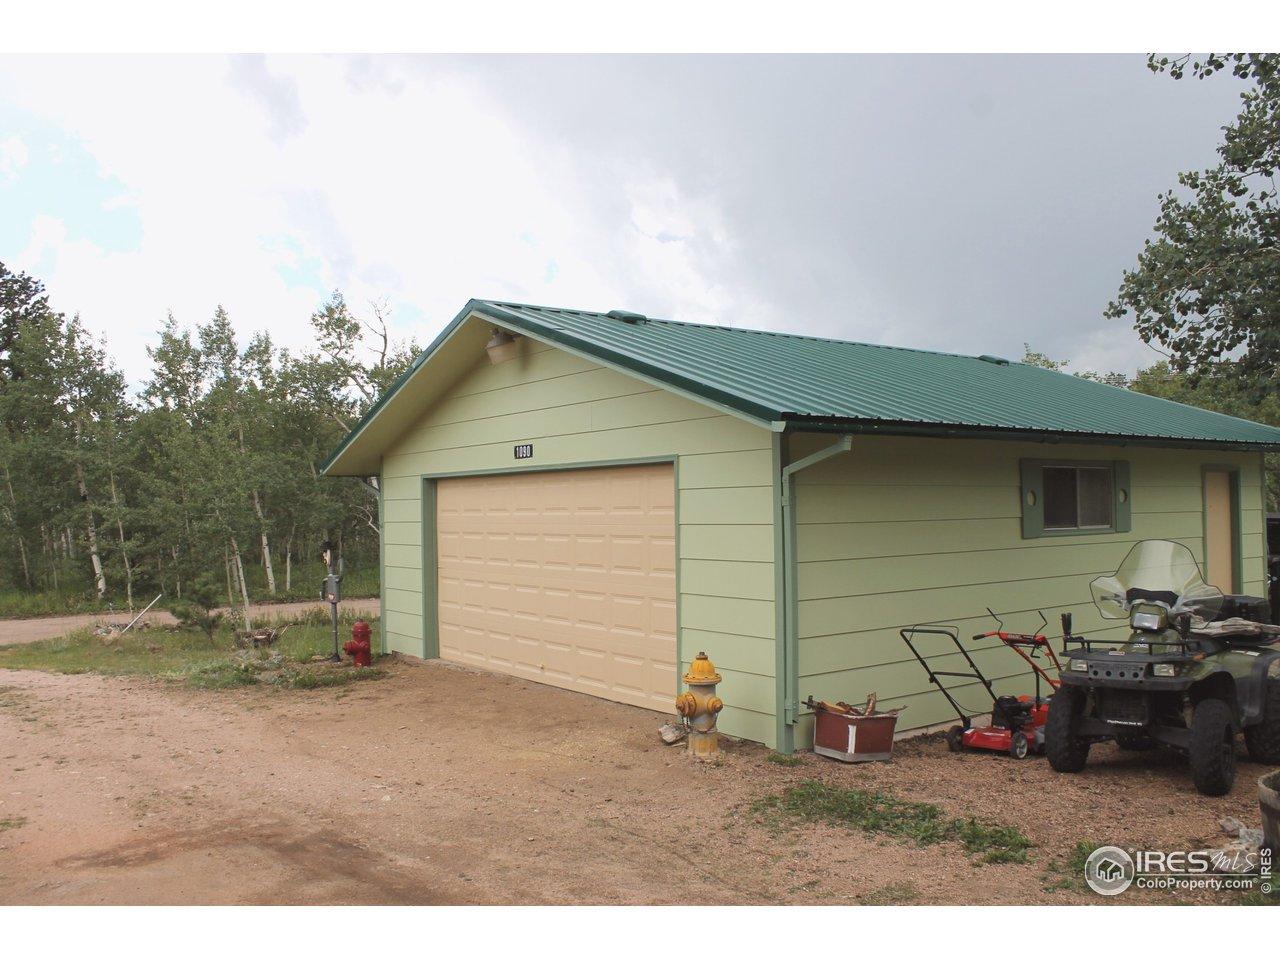 New Roof - Garage